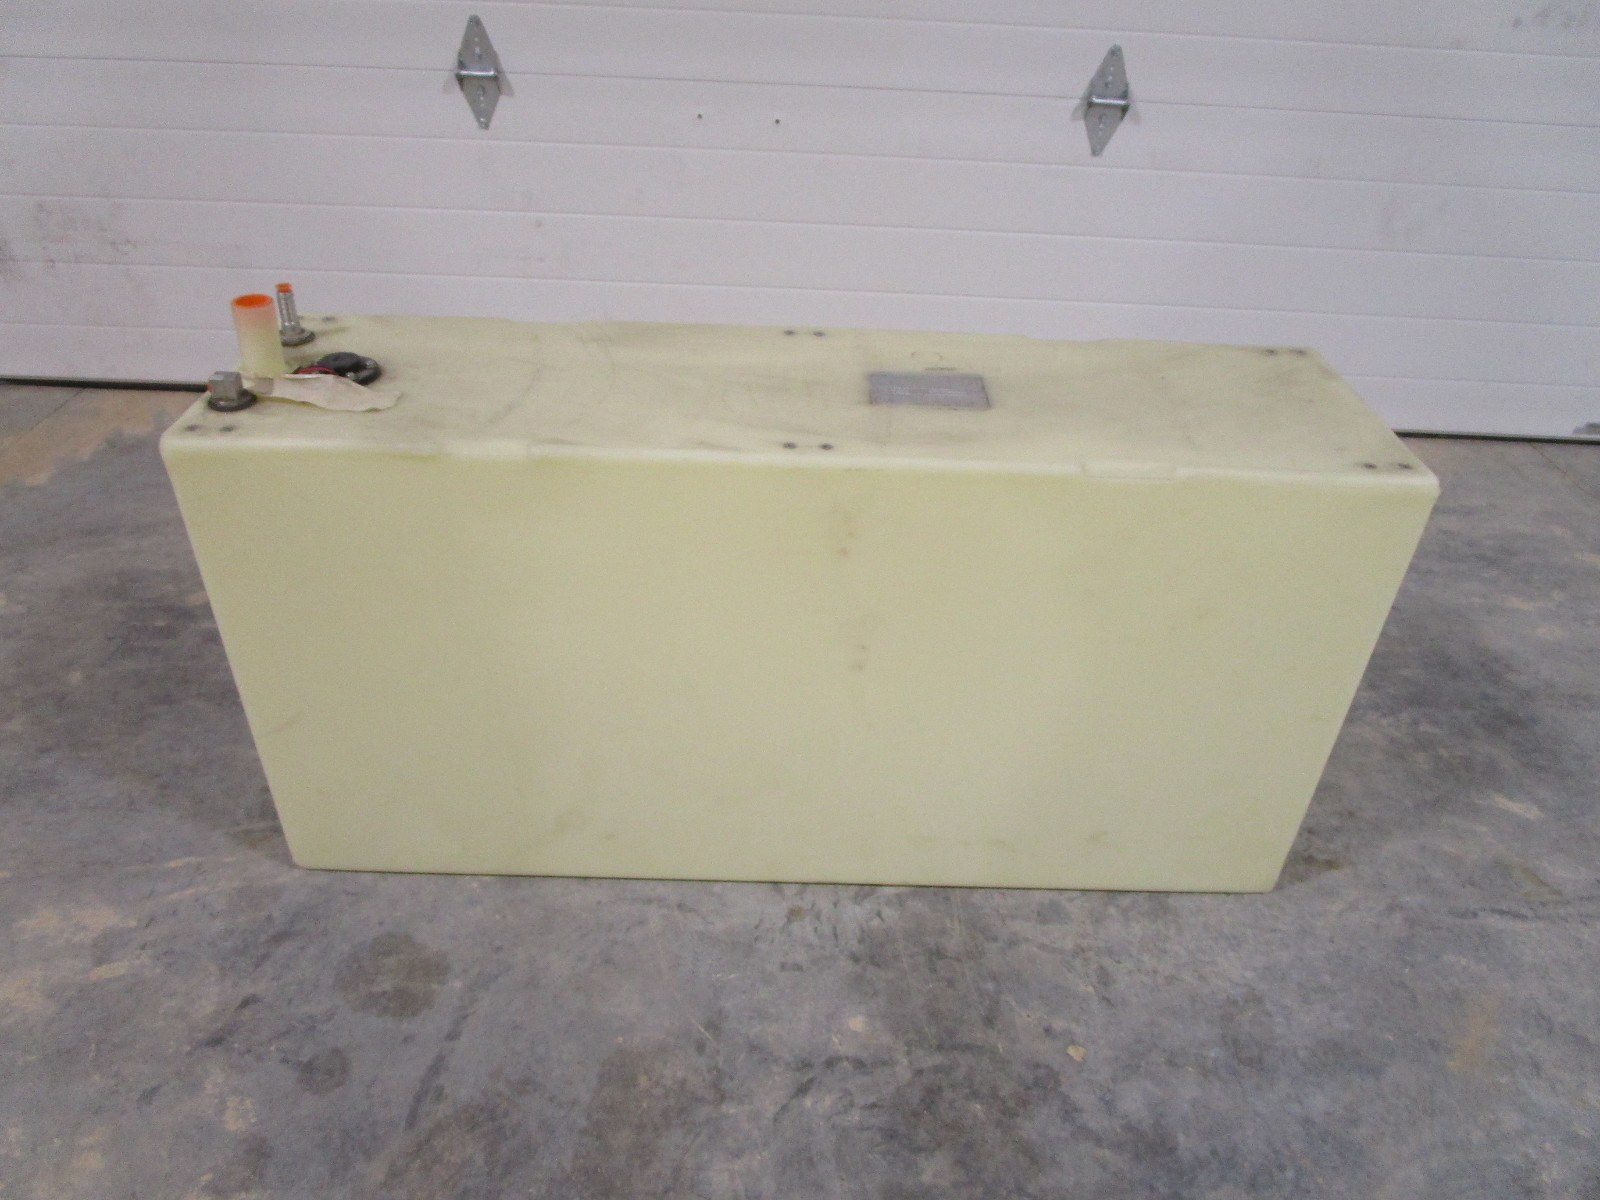 Moeller Marine 50 Gallon Plastic Below Deck Fuel Gas Tank 45 x 21 3/4 x 12 3/8